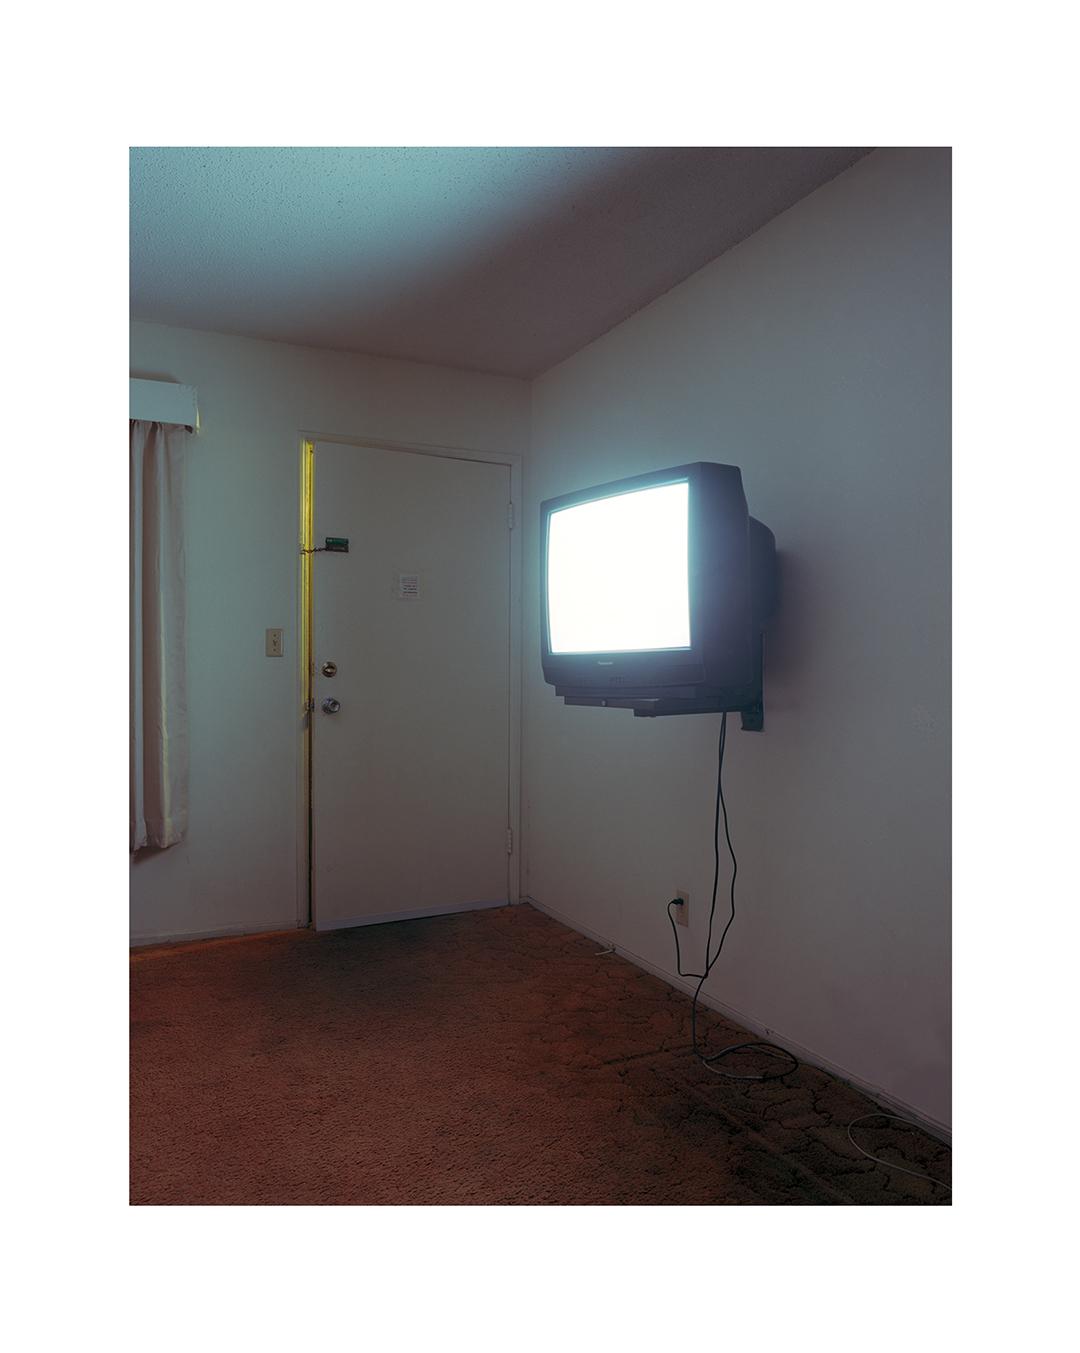 tv_019.jpg